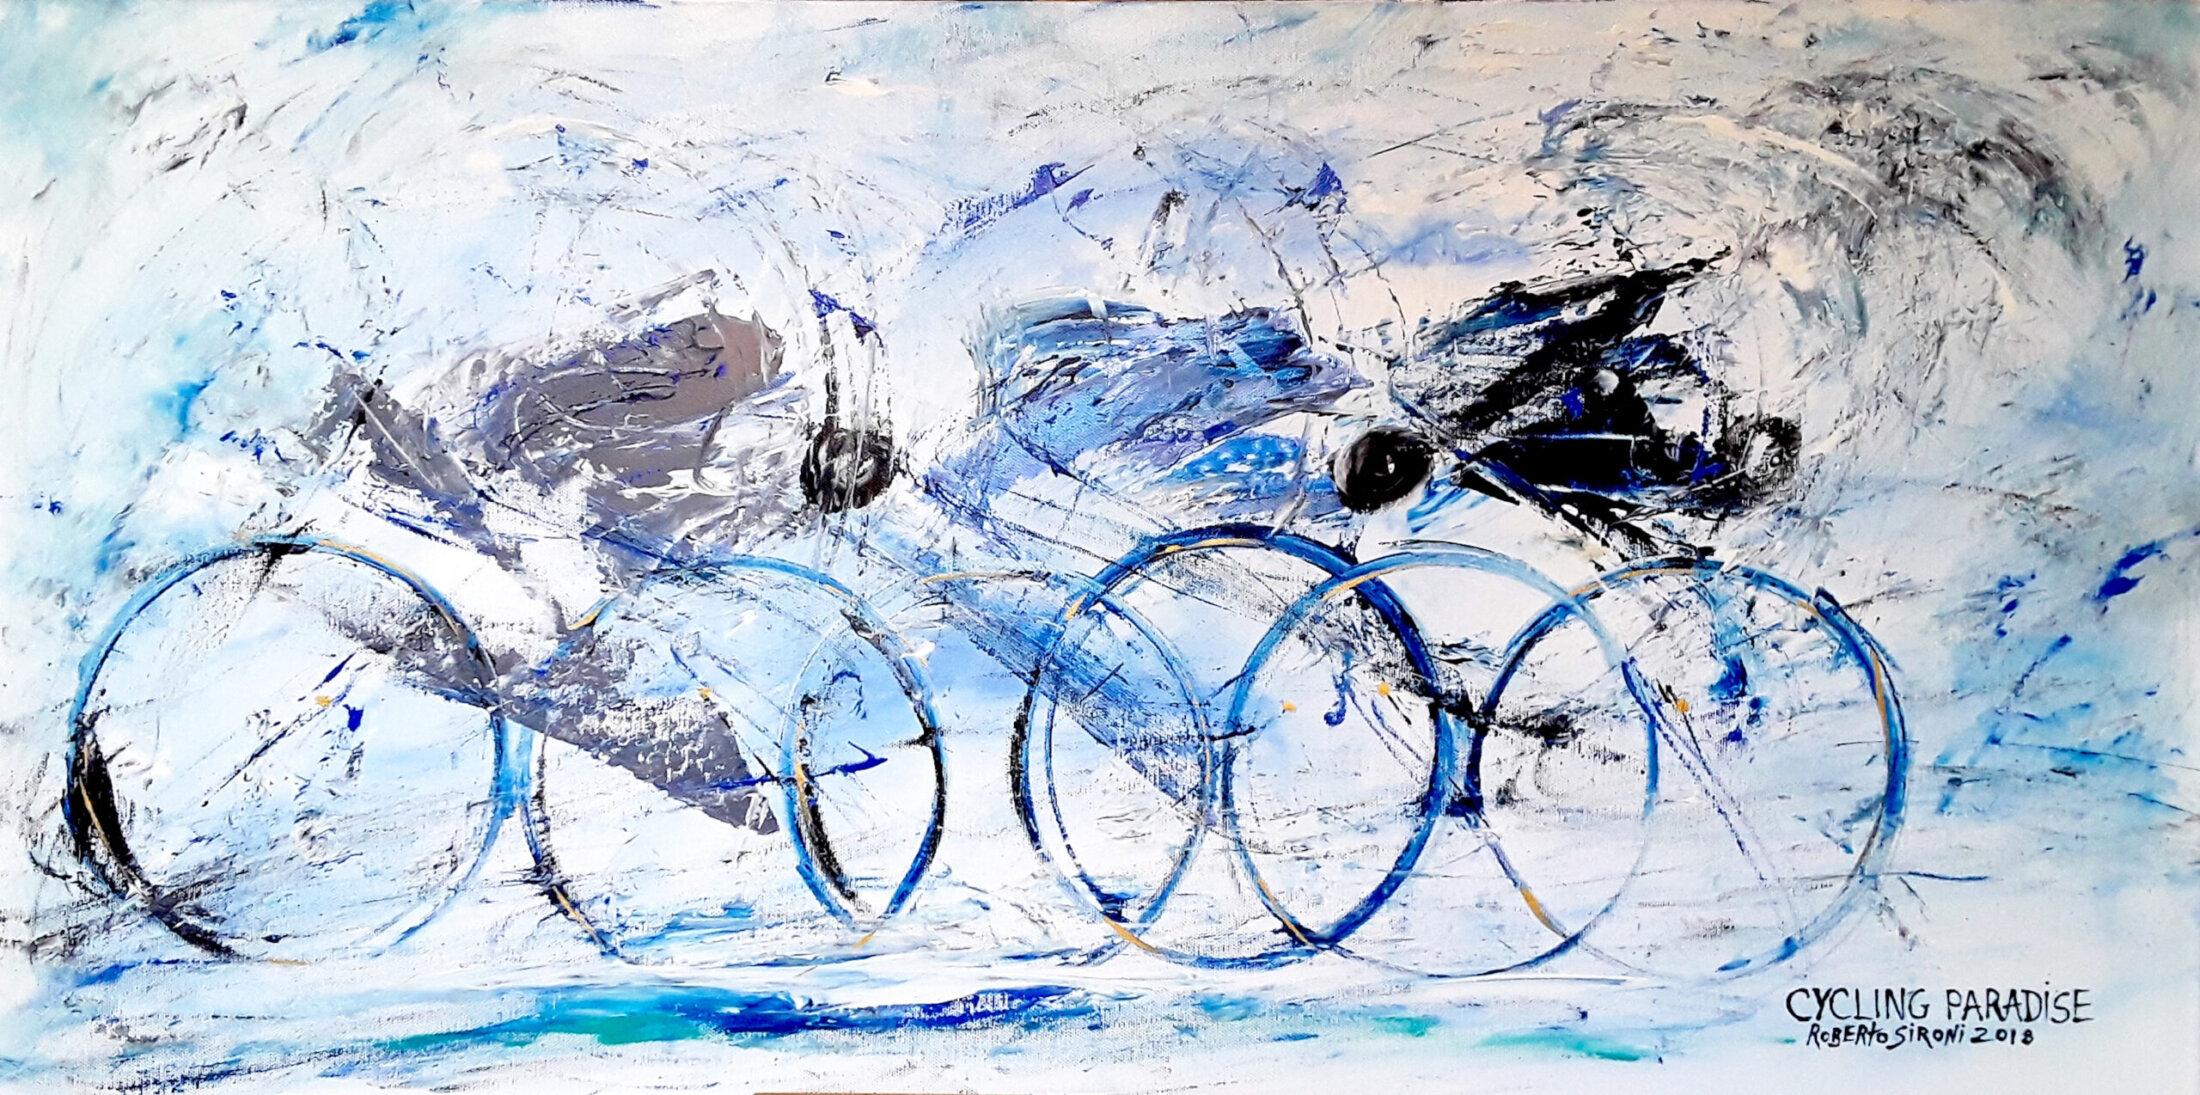 CyclingParadise-AcrilicoSuTela-50x100-RobertoSironi -300dpi